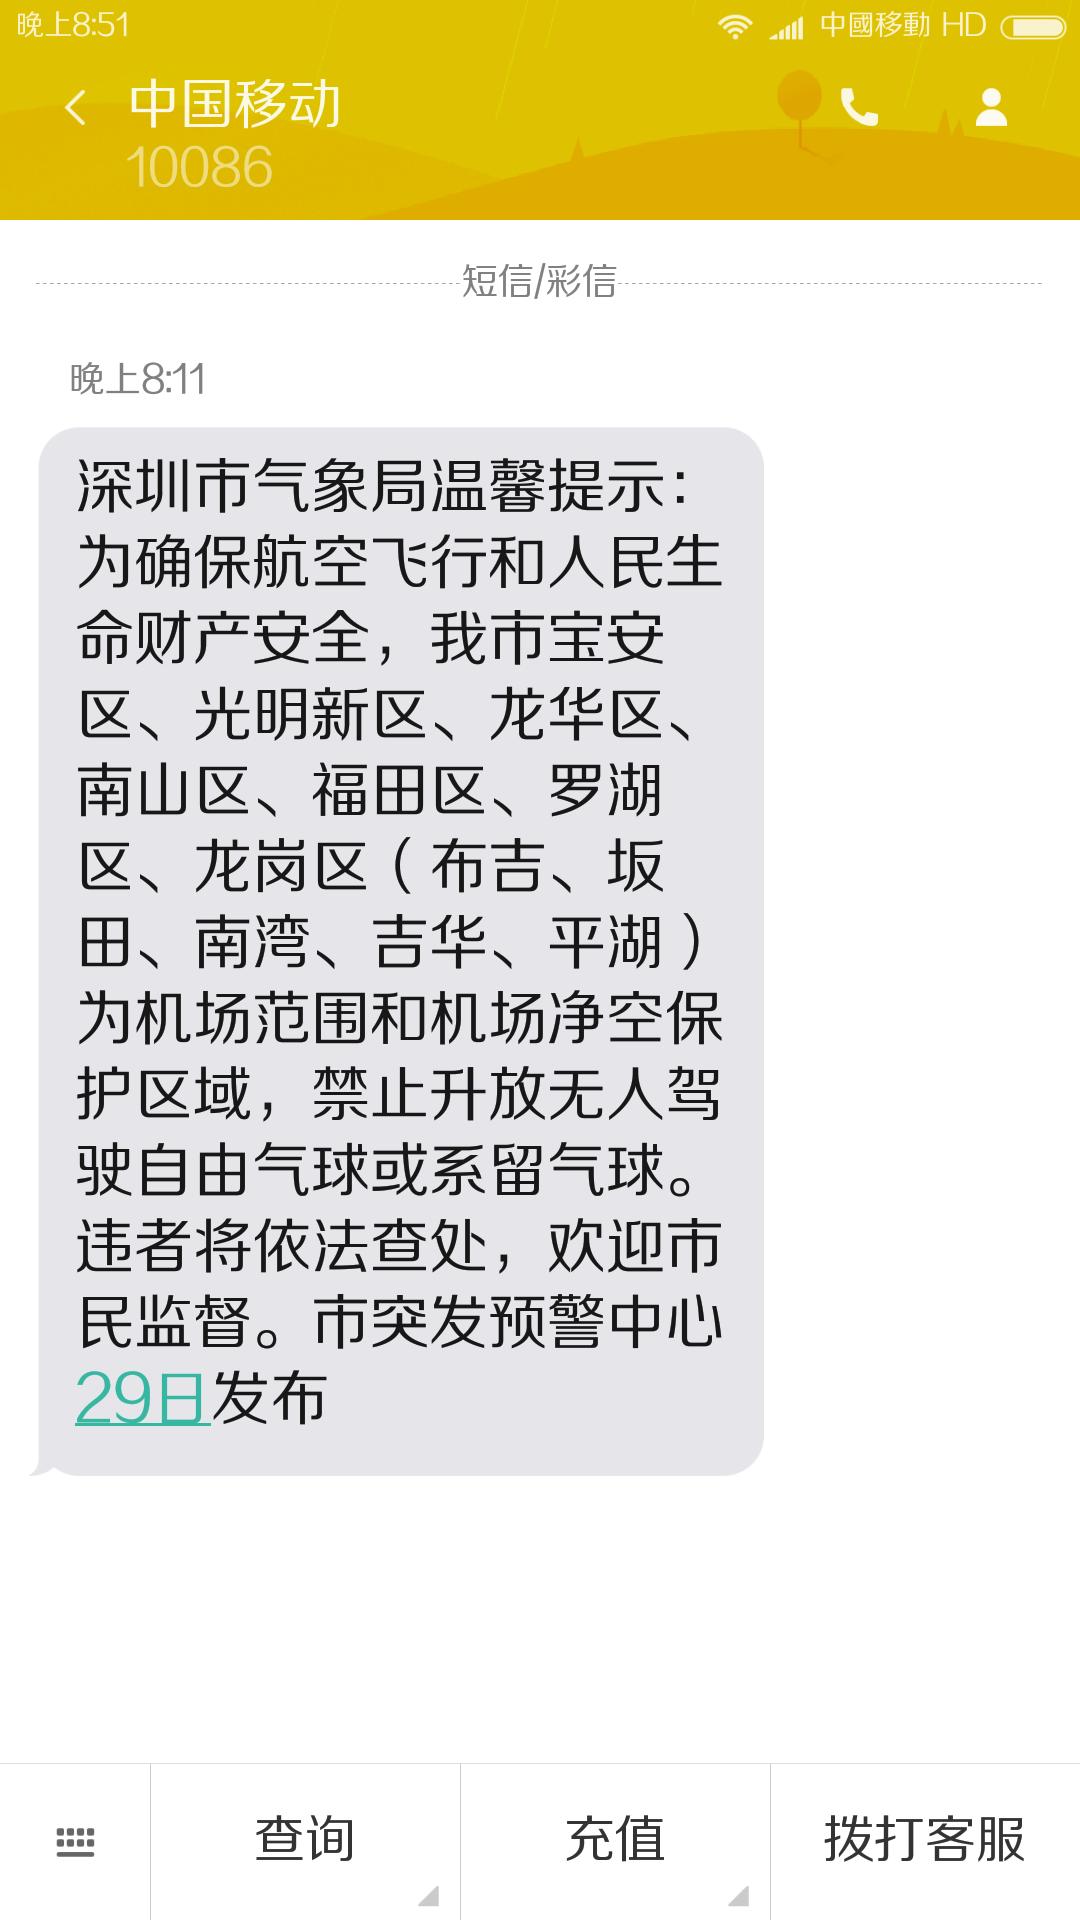 Screenshot_2017-12-29-20-51-38-043_com.android.mms.png